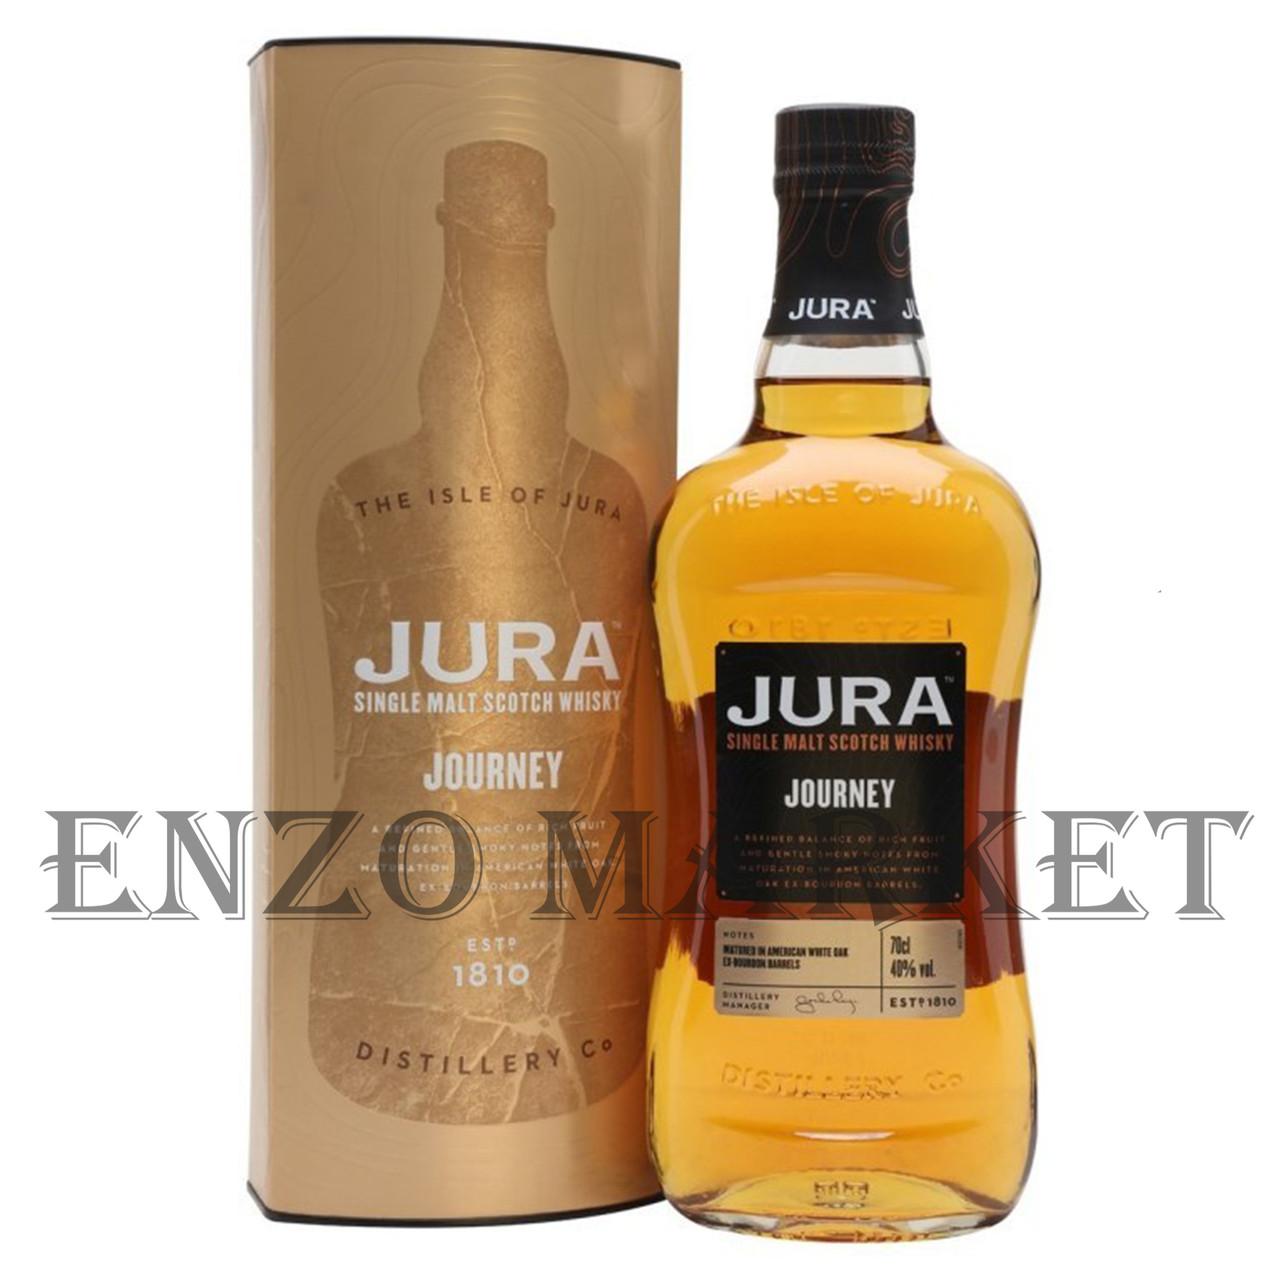 Виски Isle of Jura Journey (Айл оф Джура Джоурни) 40%, 0,7 литра